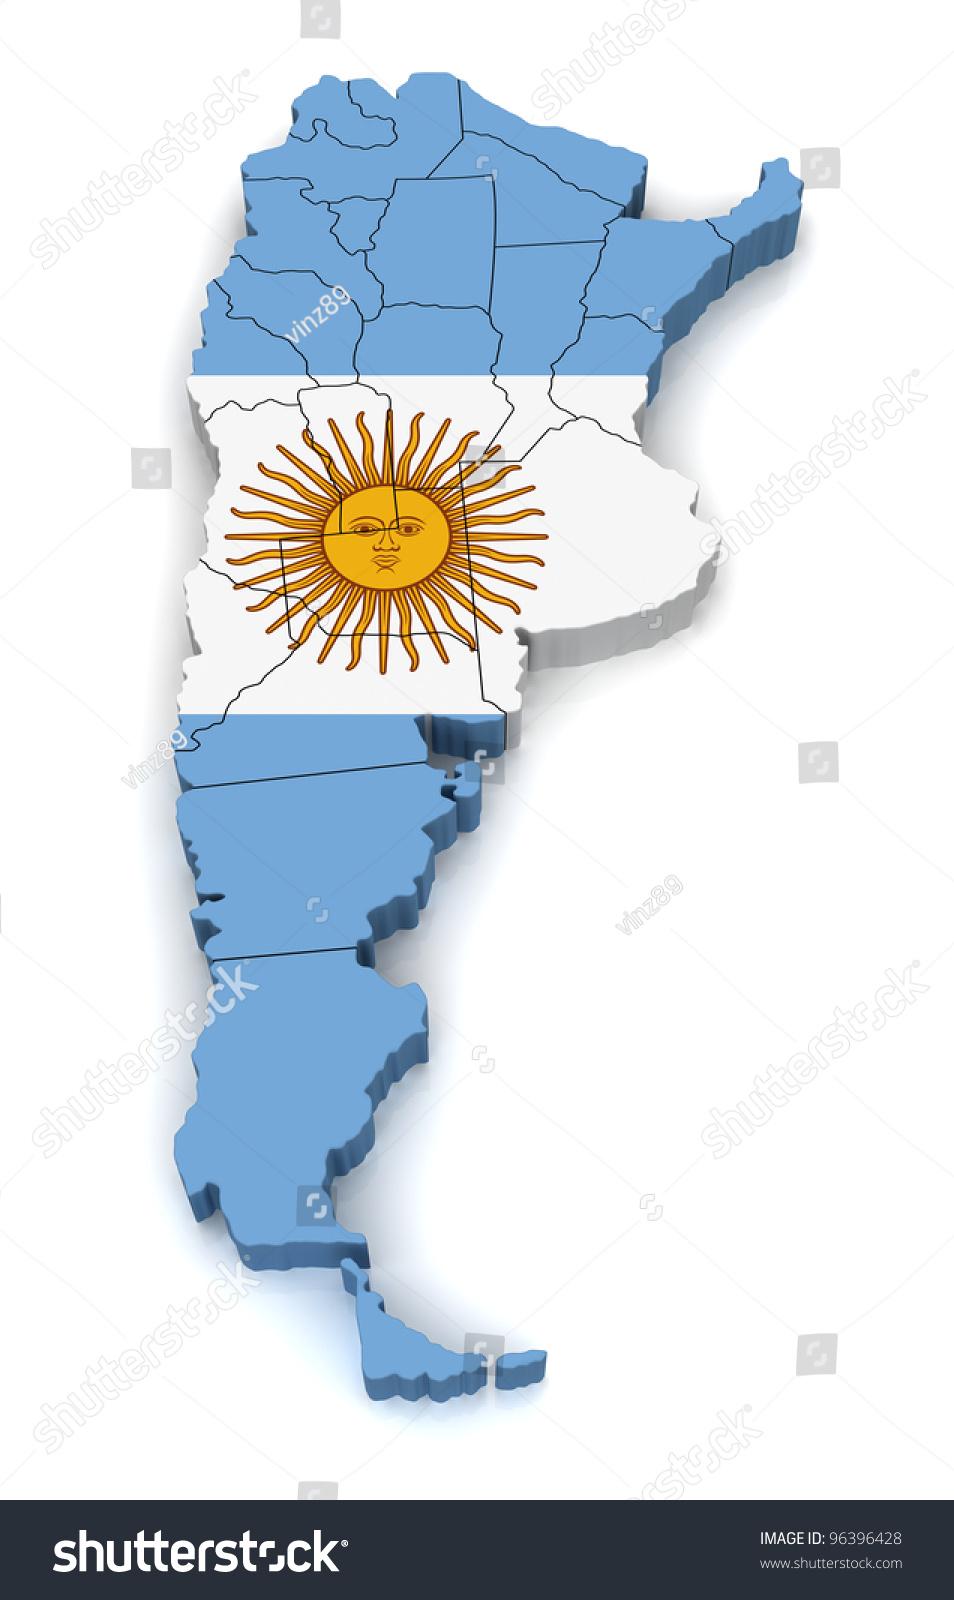 D Map Argentina Stock Illustration Shutterstock - Argentina 3d map